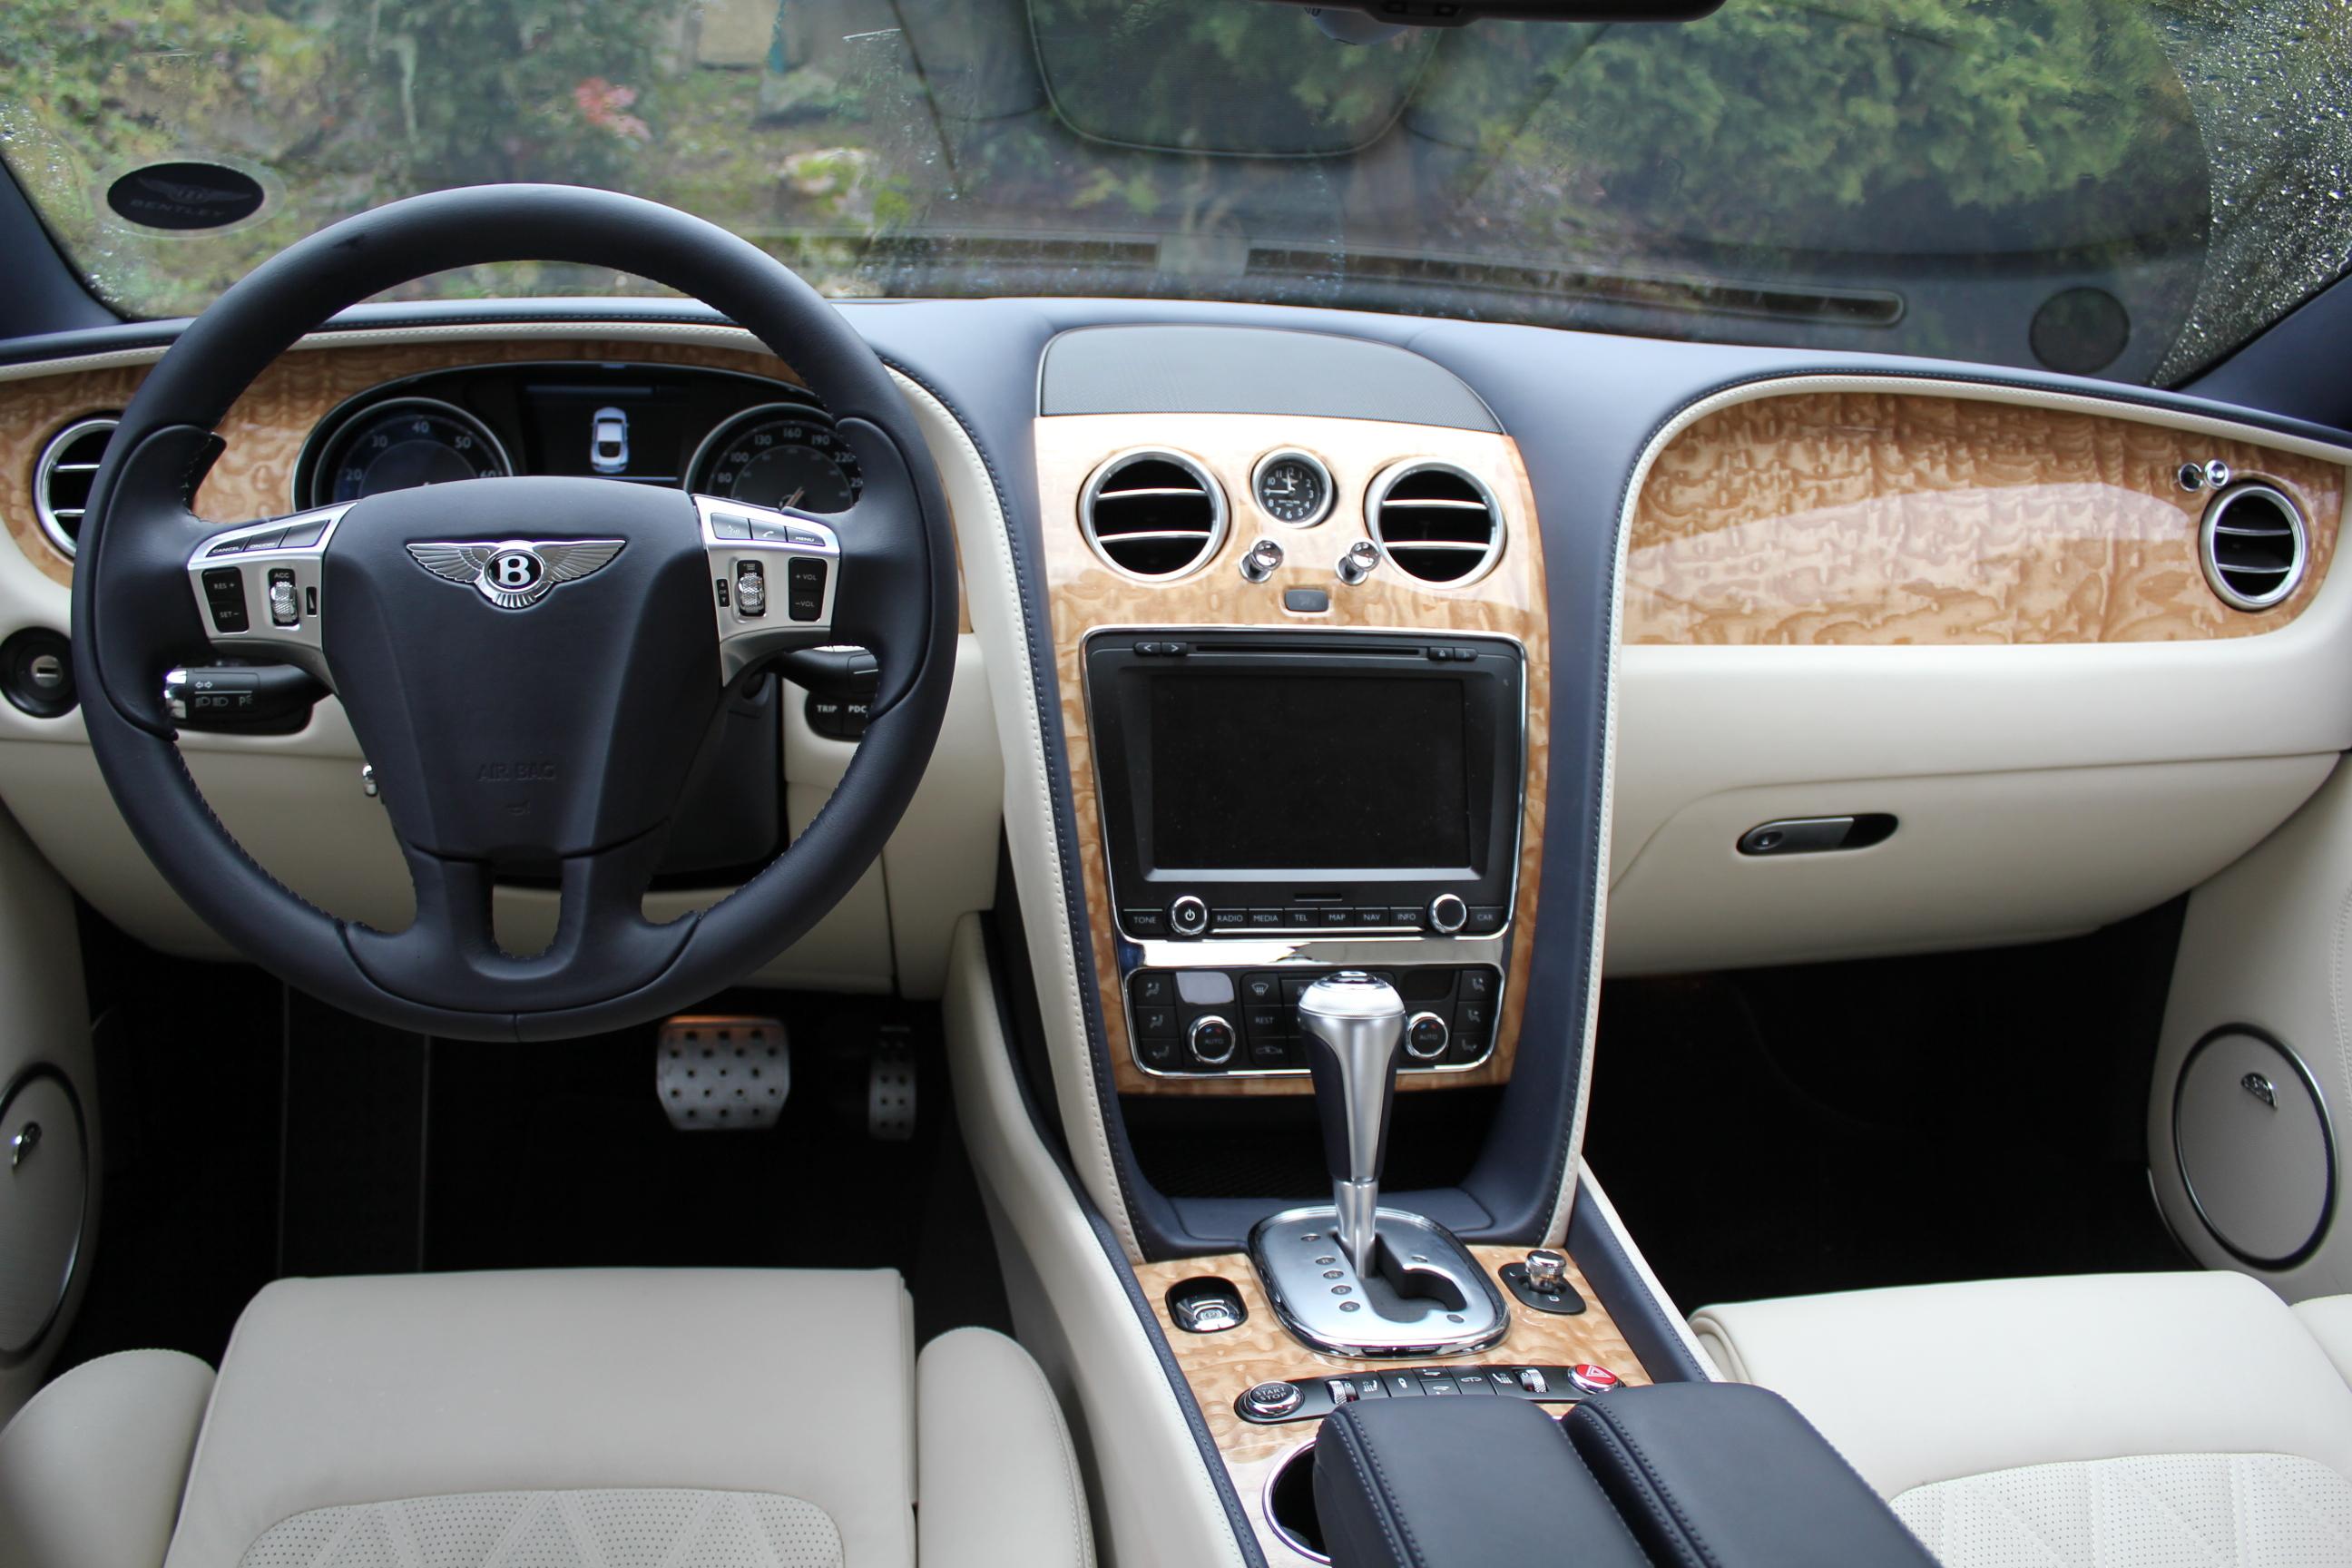 Essai Vid 233 O Bentley Continental Gt Speed So Scandalous